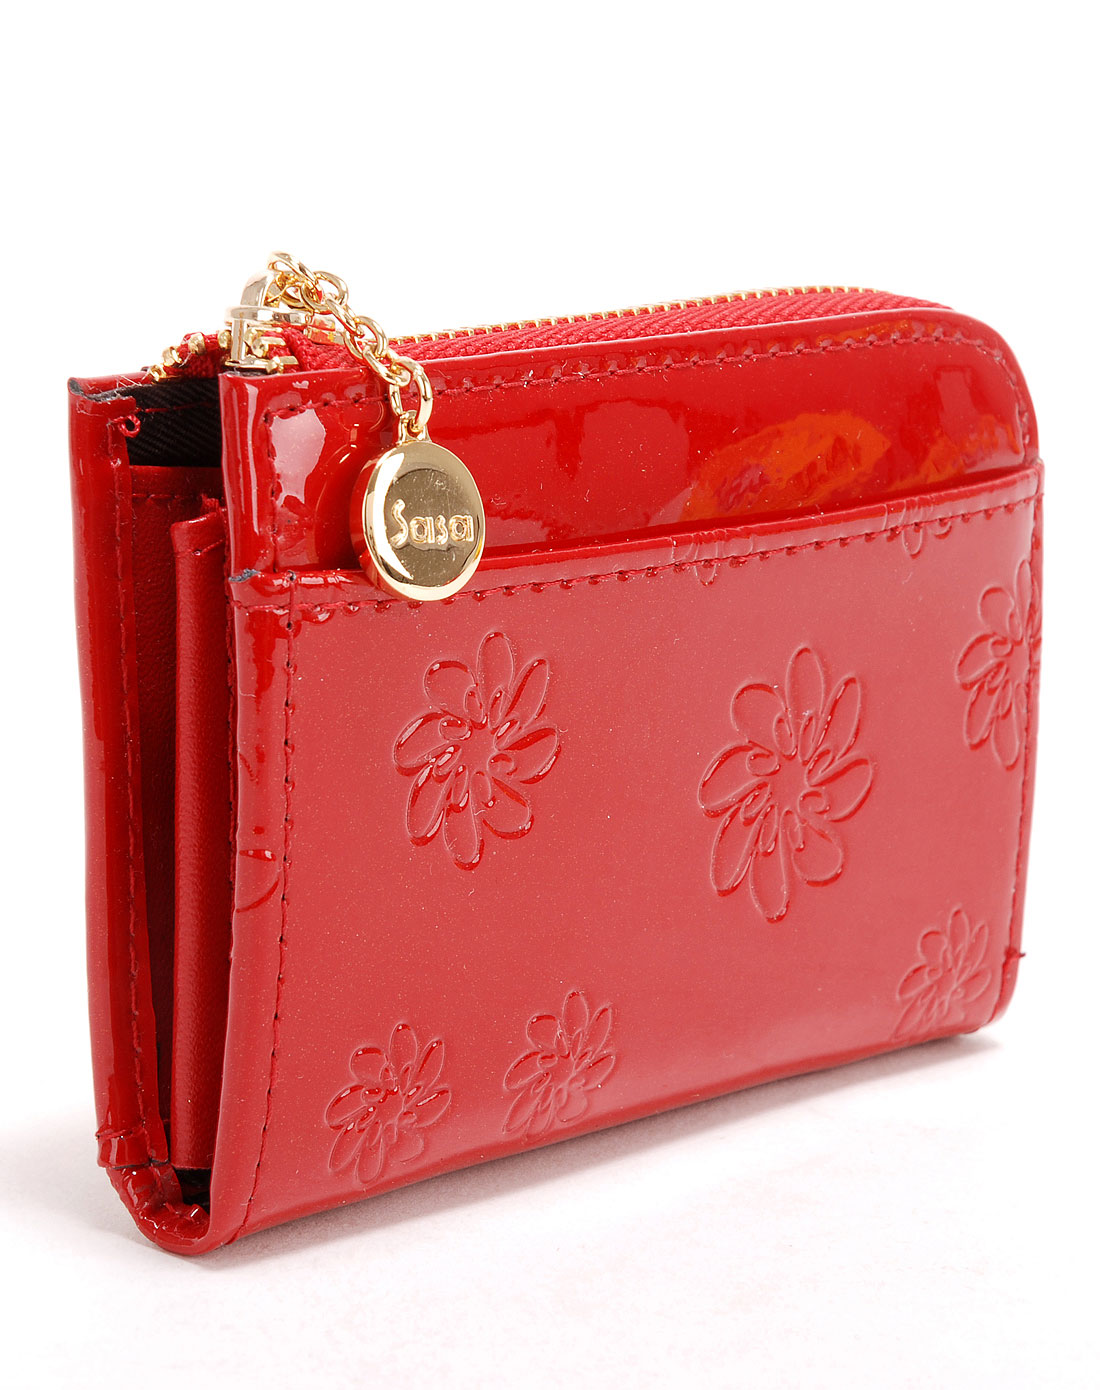 sasa箱包专场-红色时尚零钱包